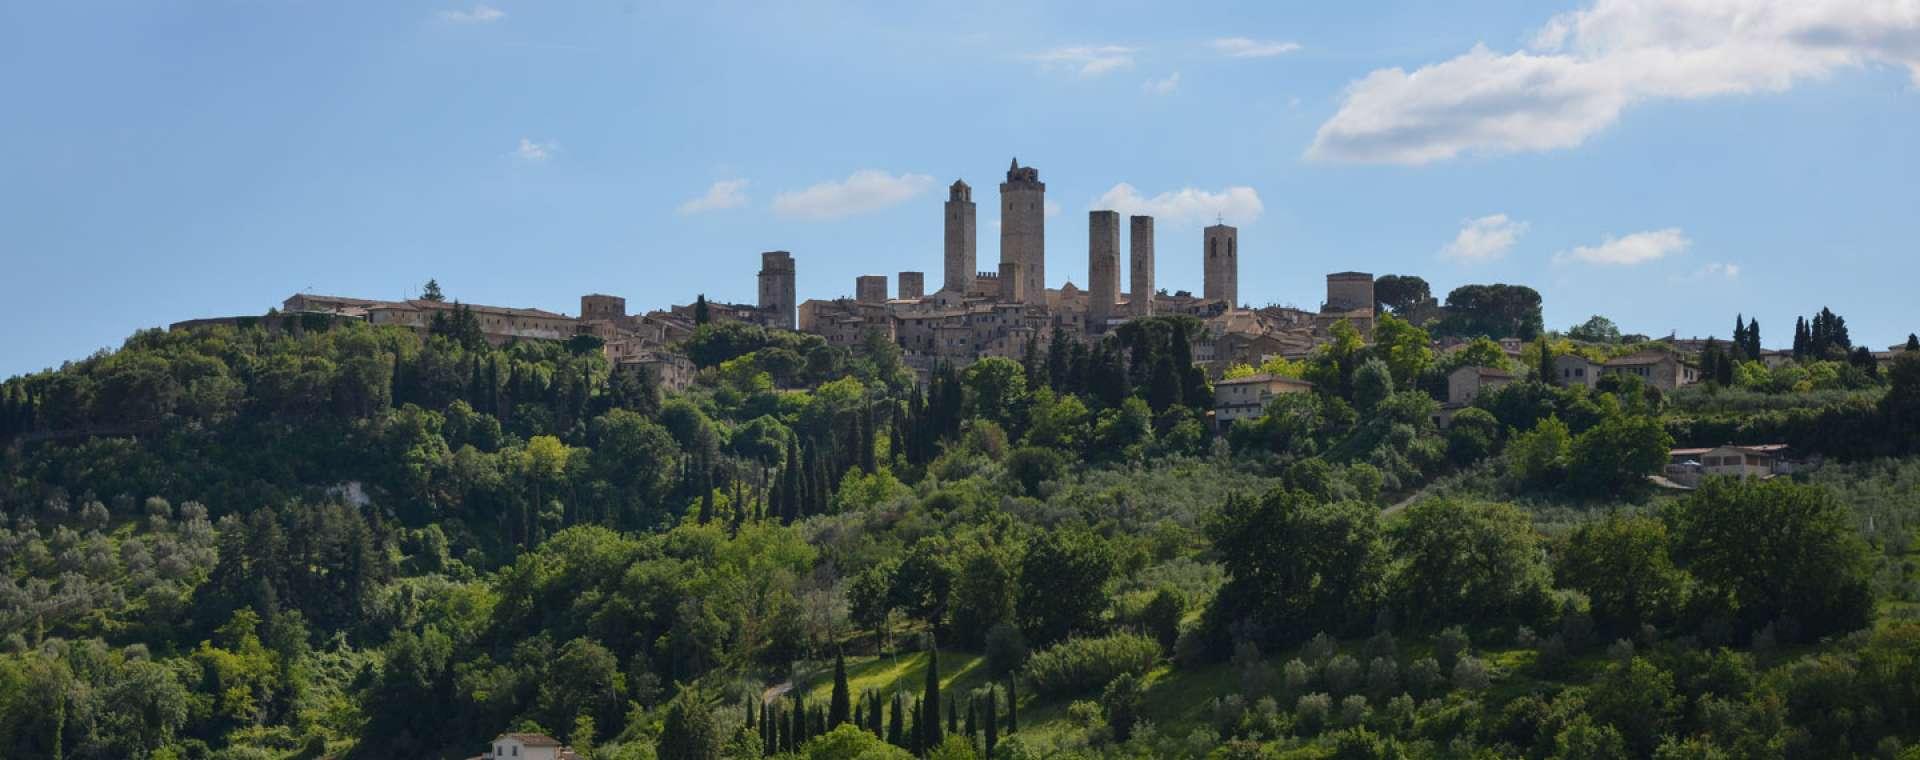 Visit 7 UNESCO World Heritage Sites in Tuscany